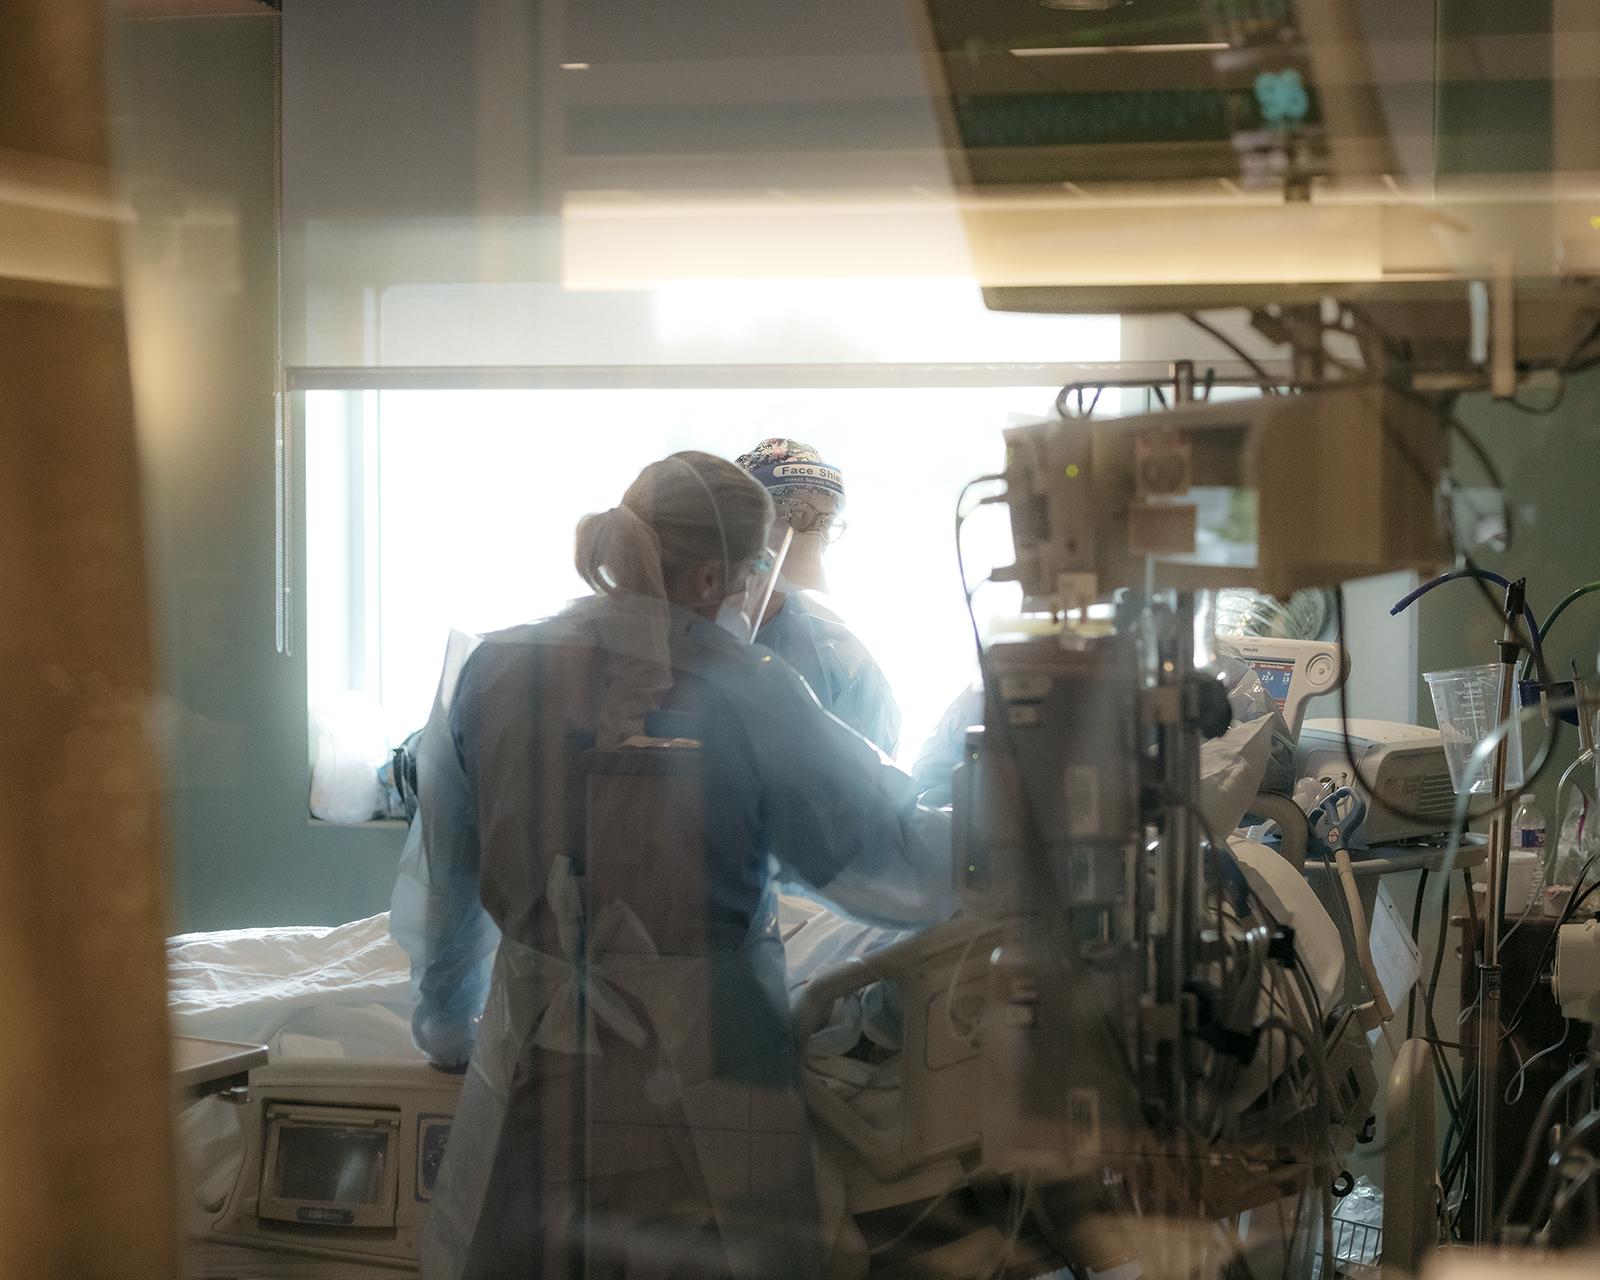 Nurses check on a patient in the ICU Covid-19 ward at NEA Baptist Memorial Hospitalin Jonesboro, Arkansas, on August 4.